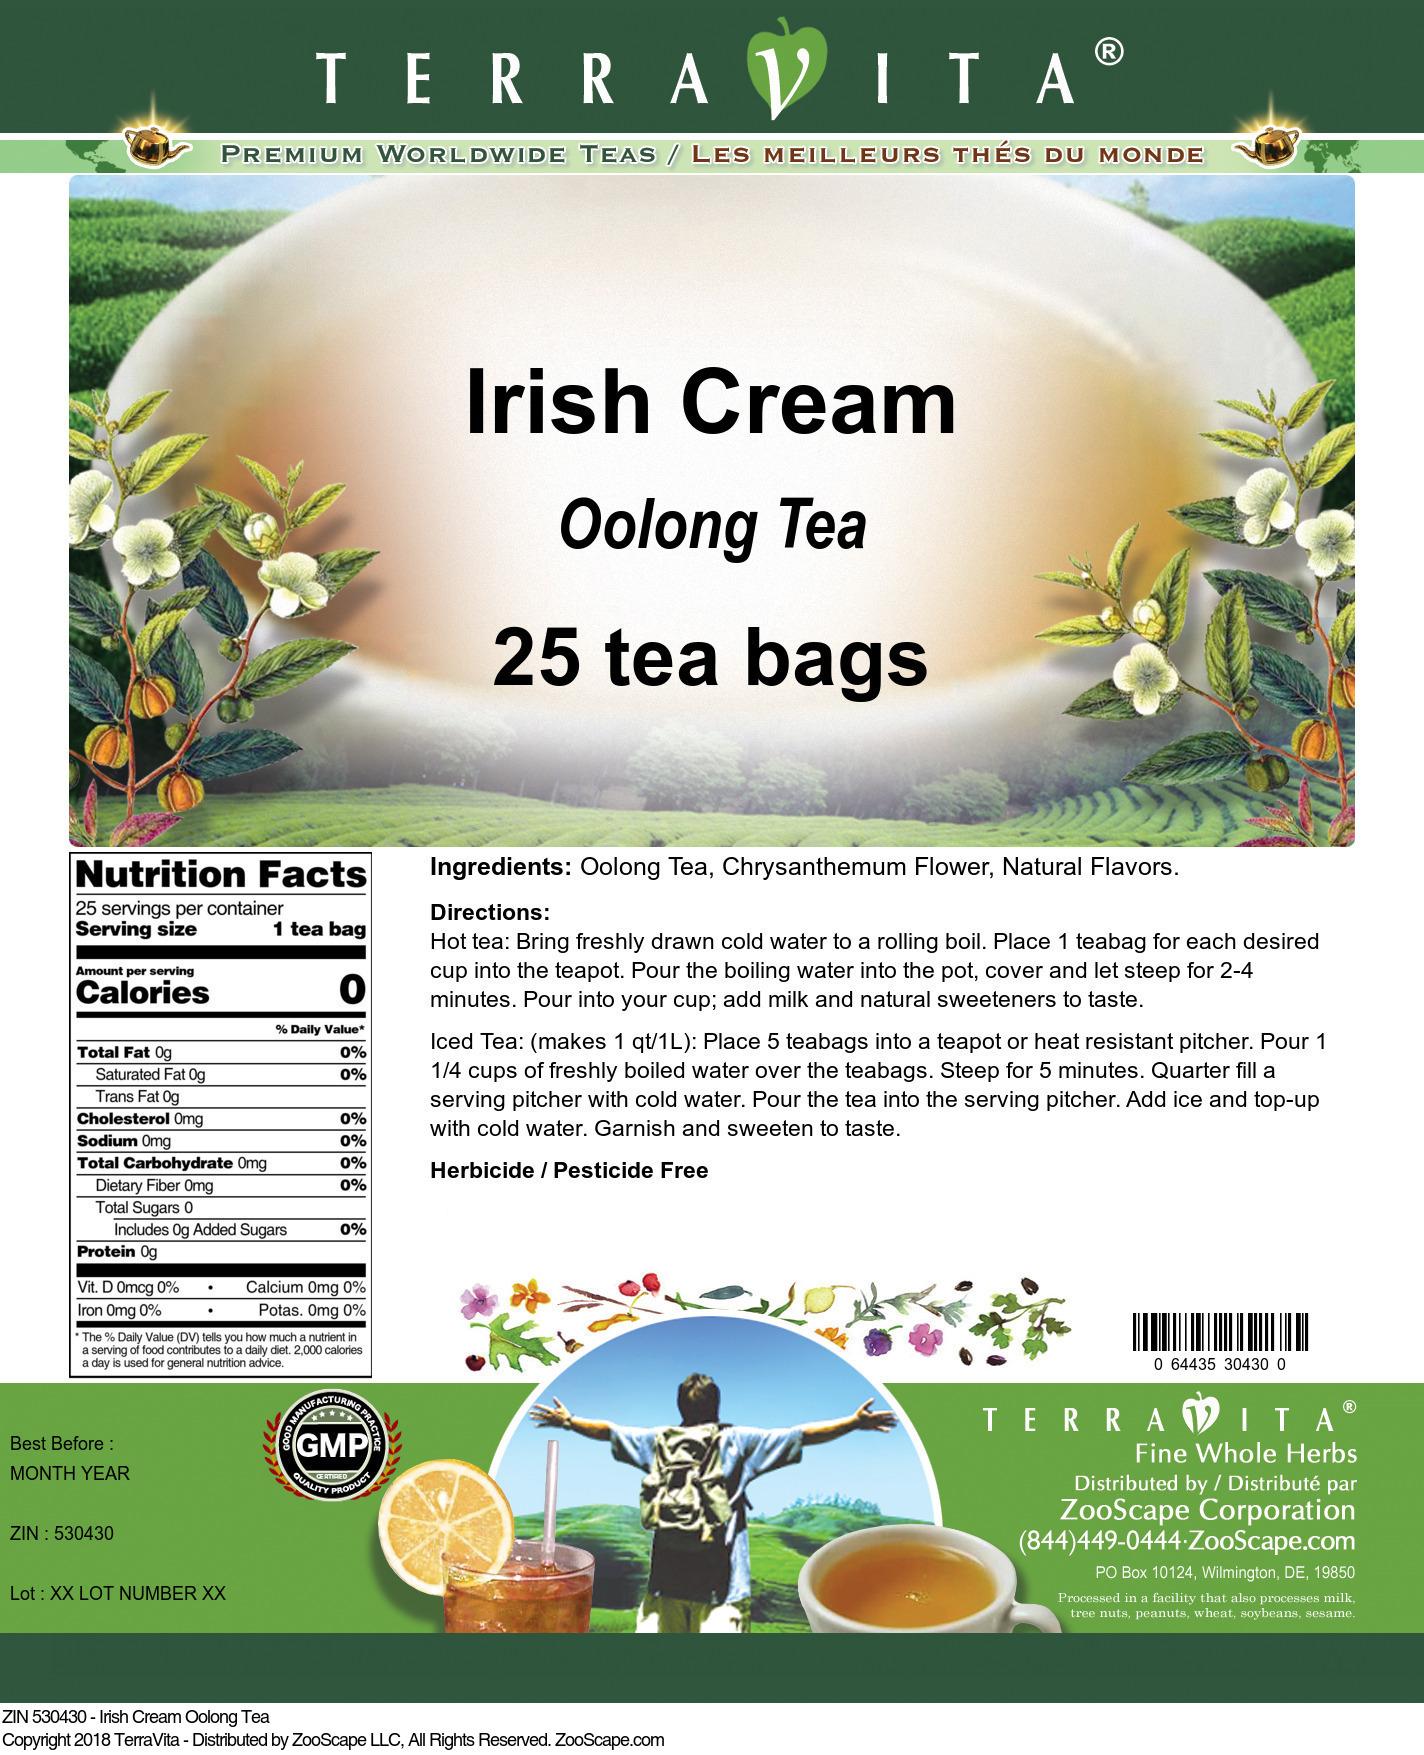 Irish Cream Oolong Tea